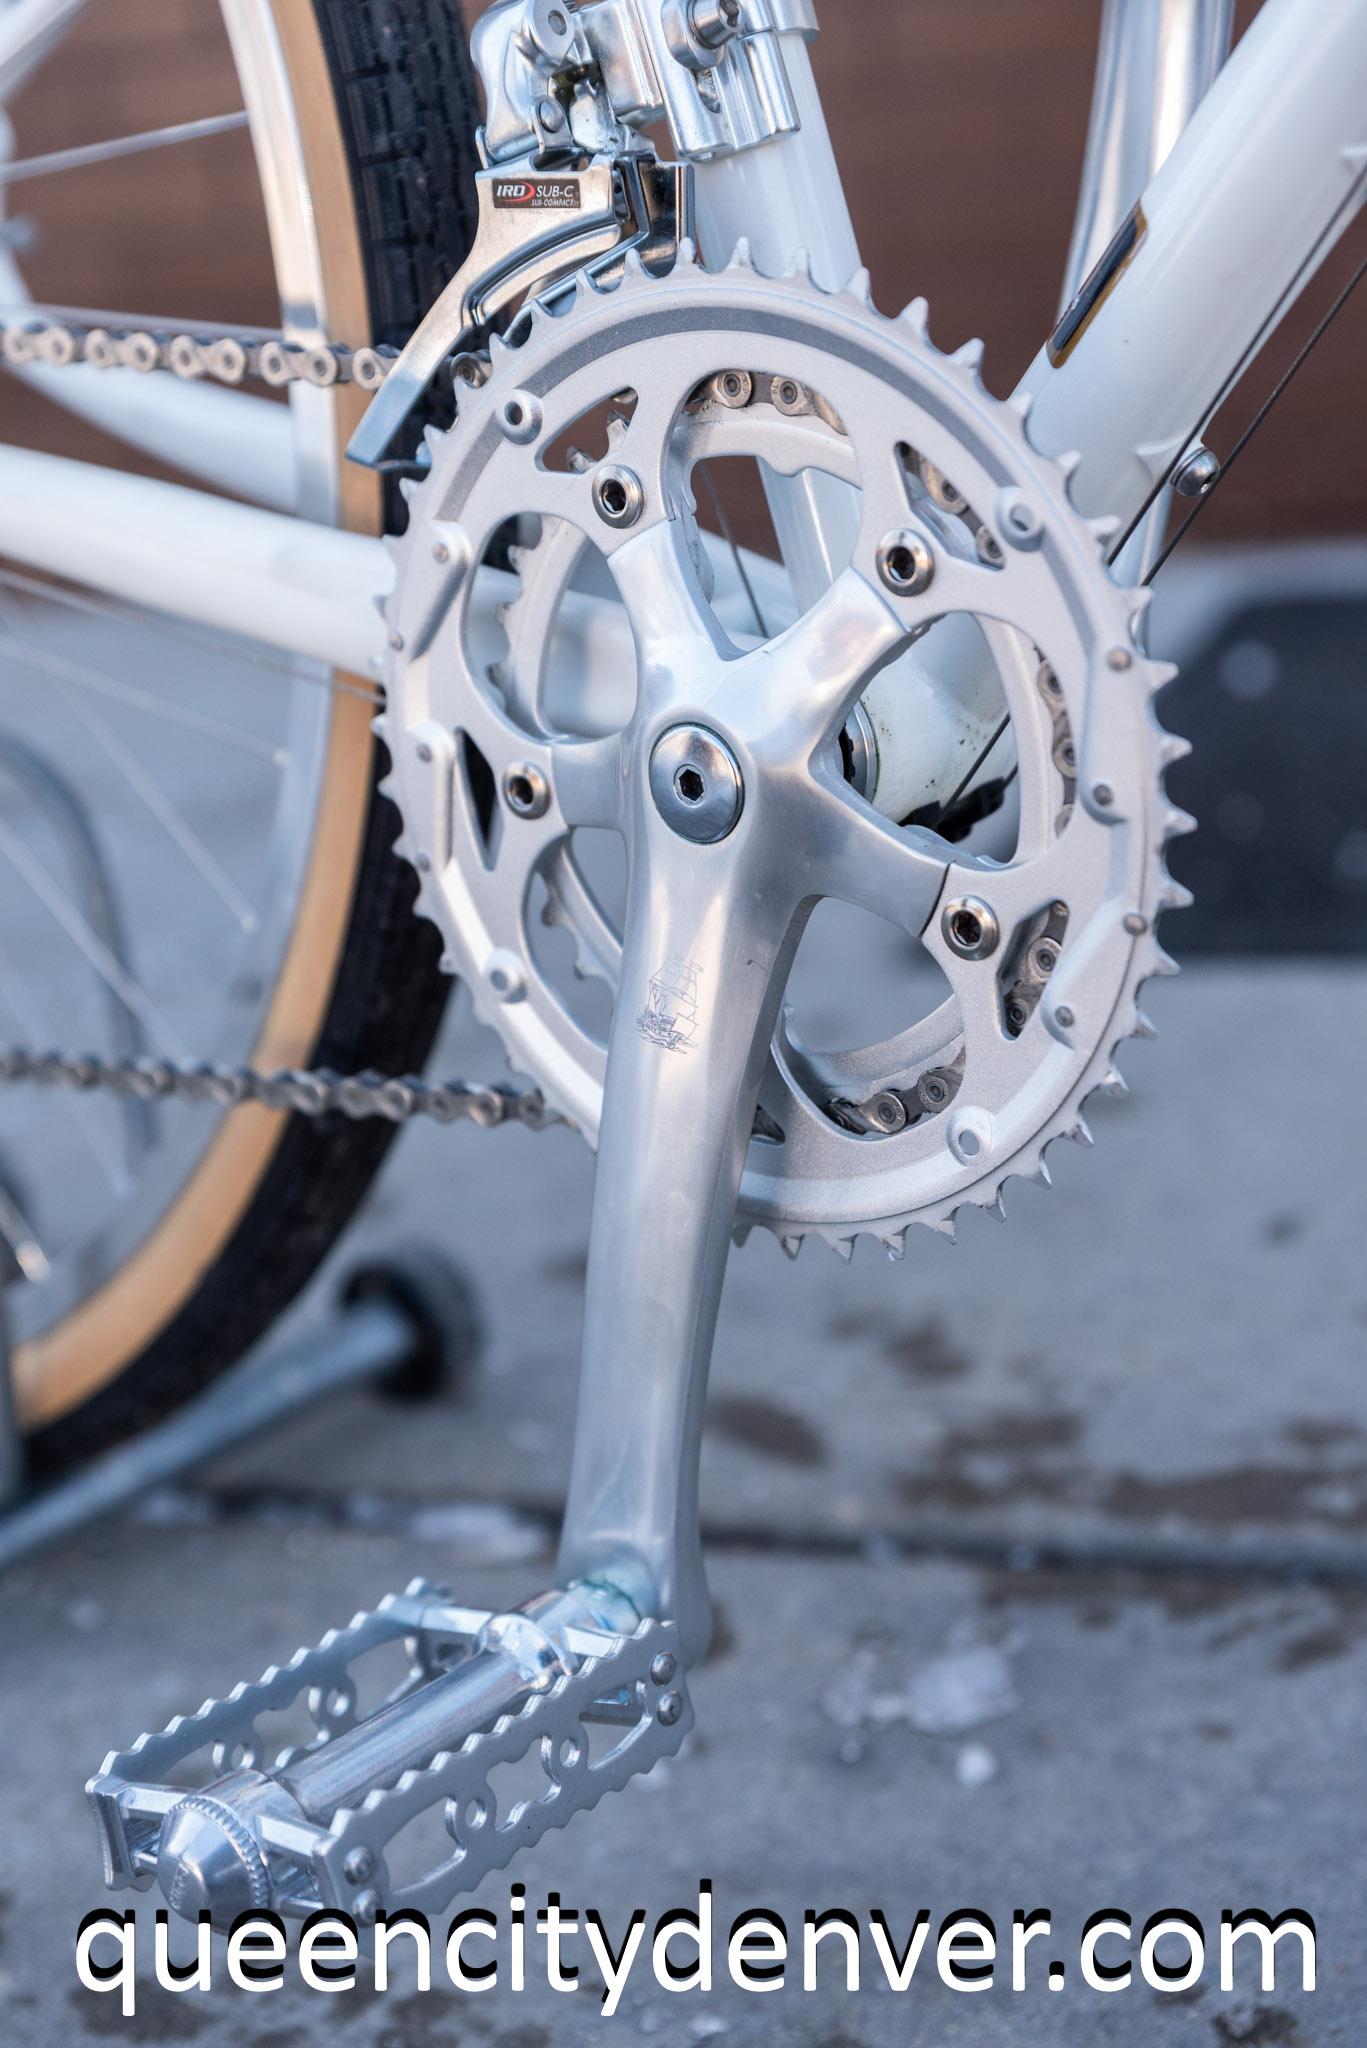 MKS touring pedals, New Albion crankset